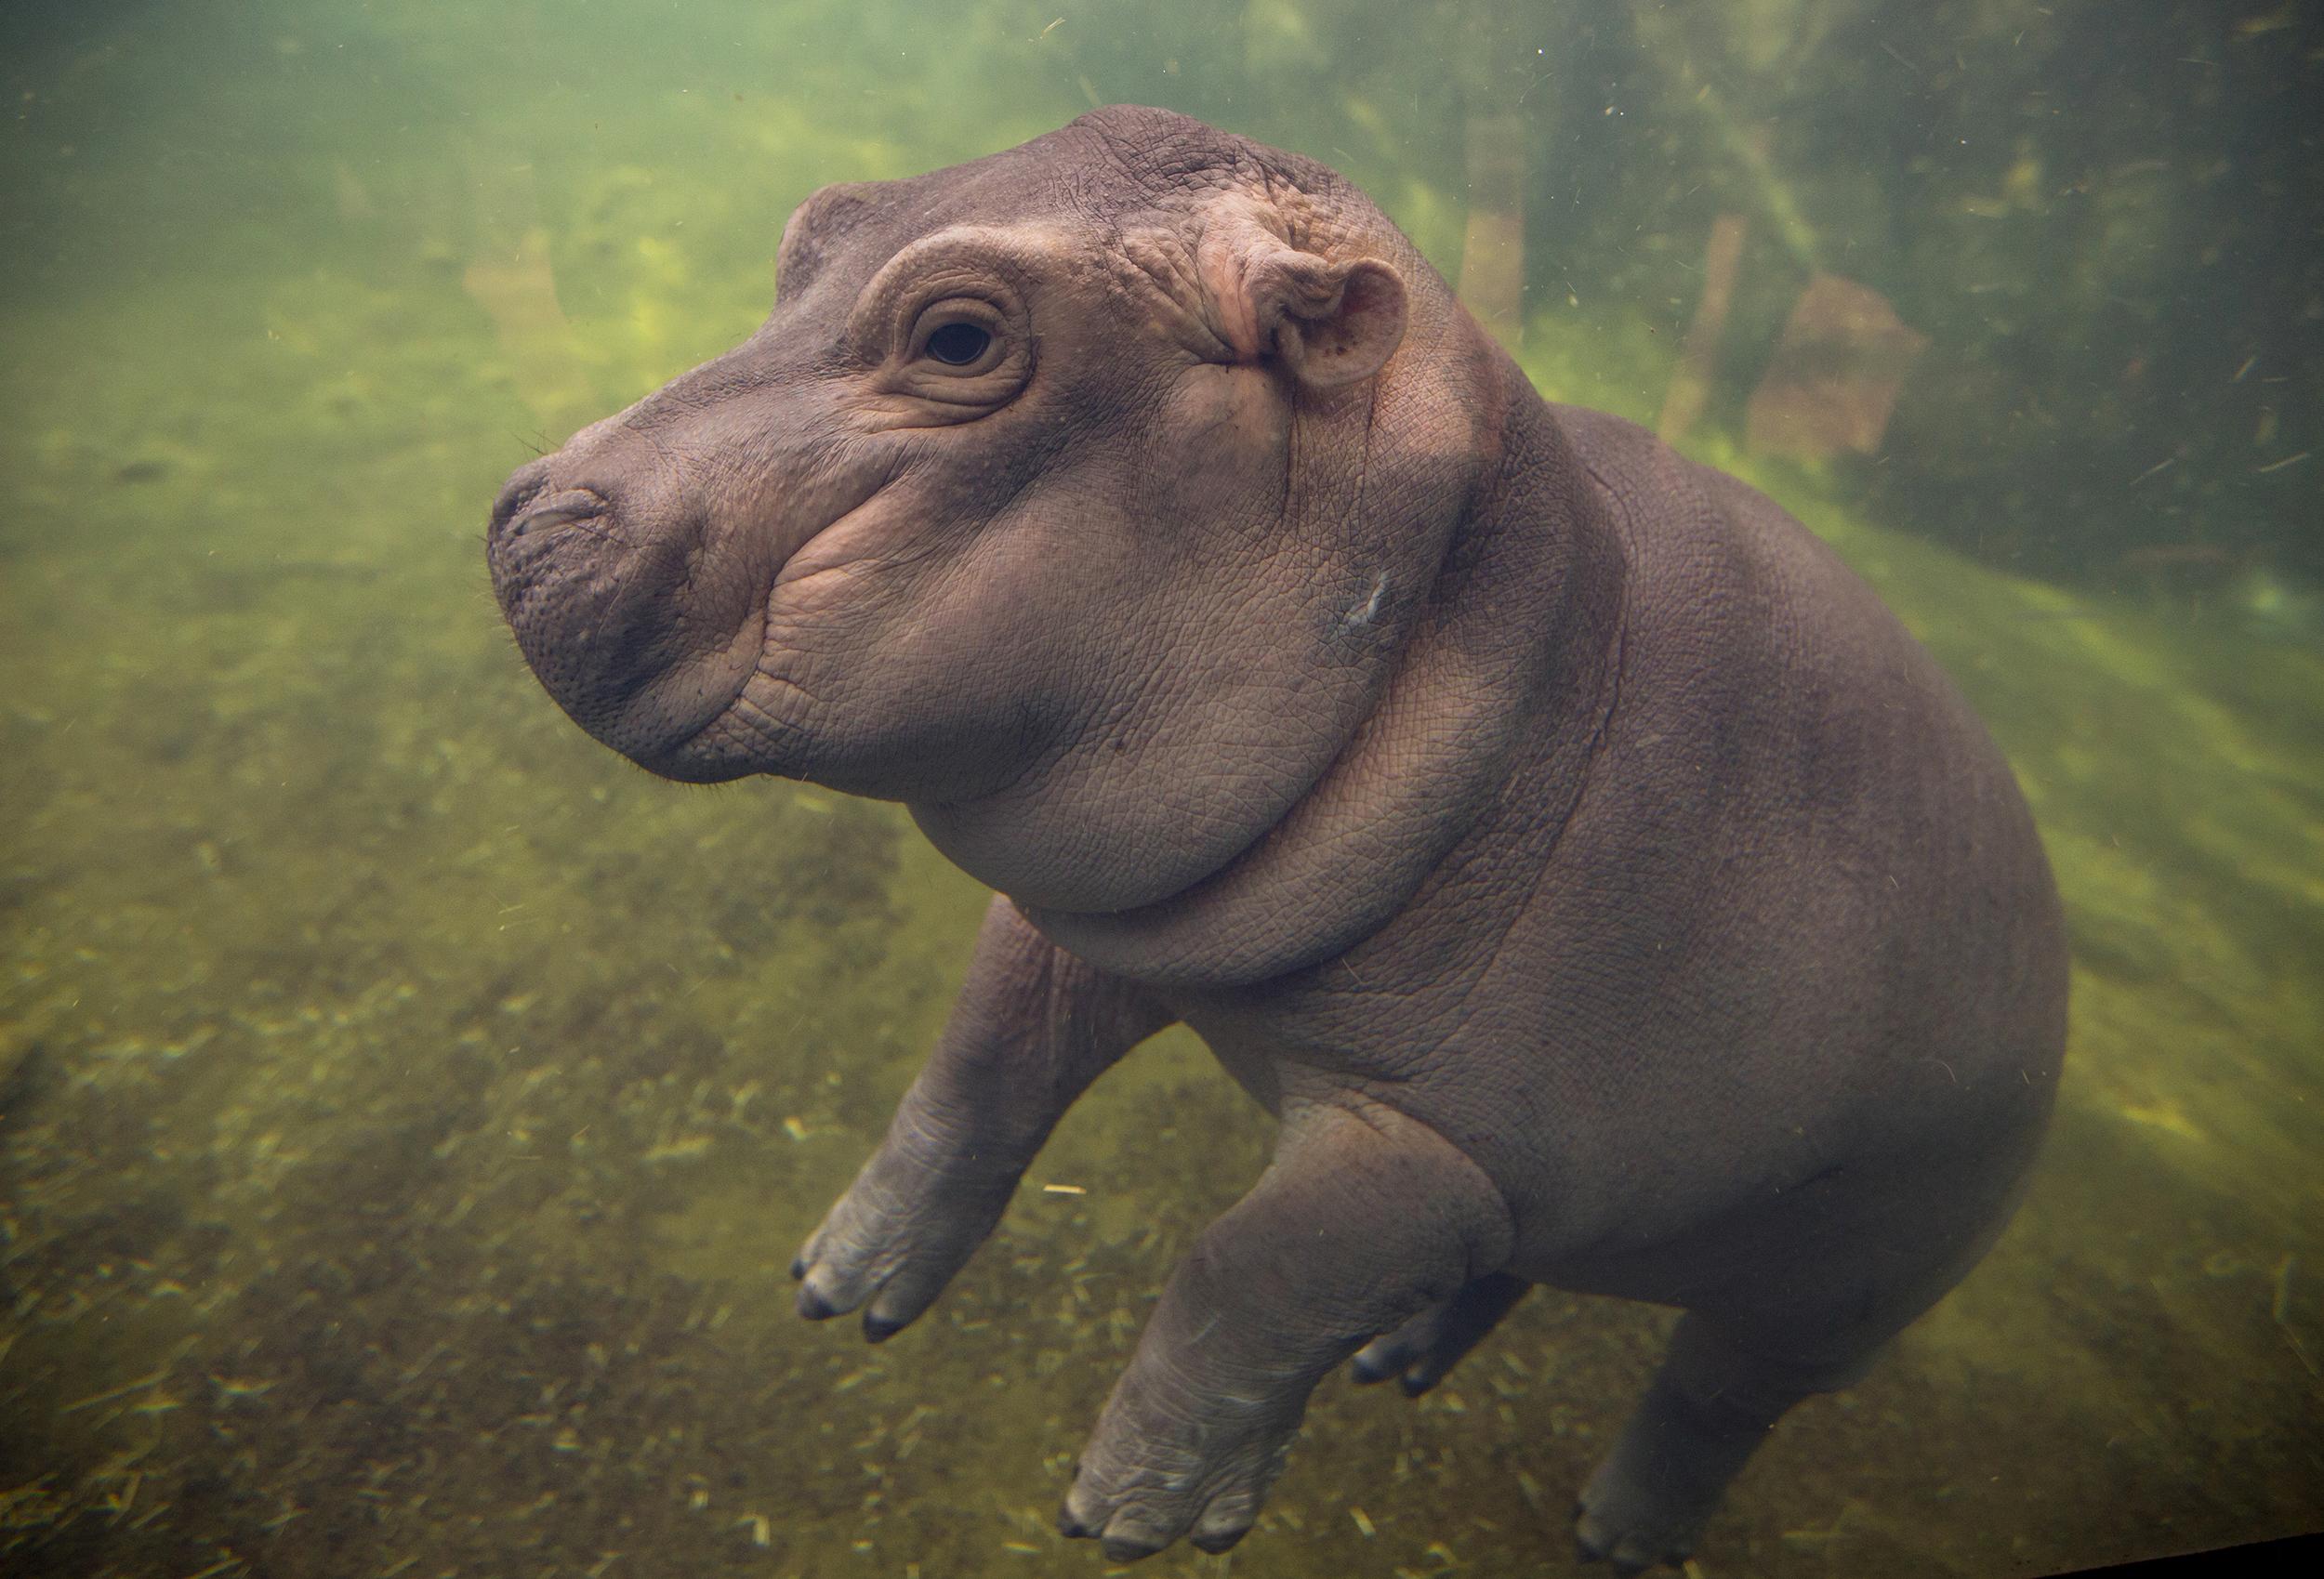 Cincinnati Zoo S Baby Hippo To Star In Facebook Video